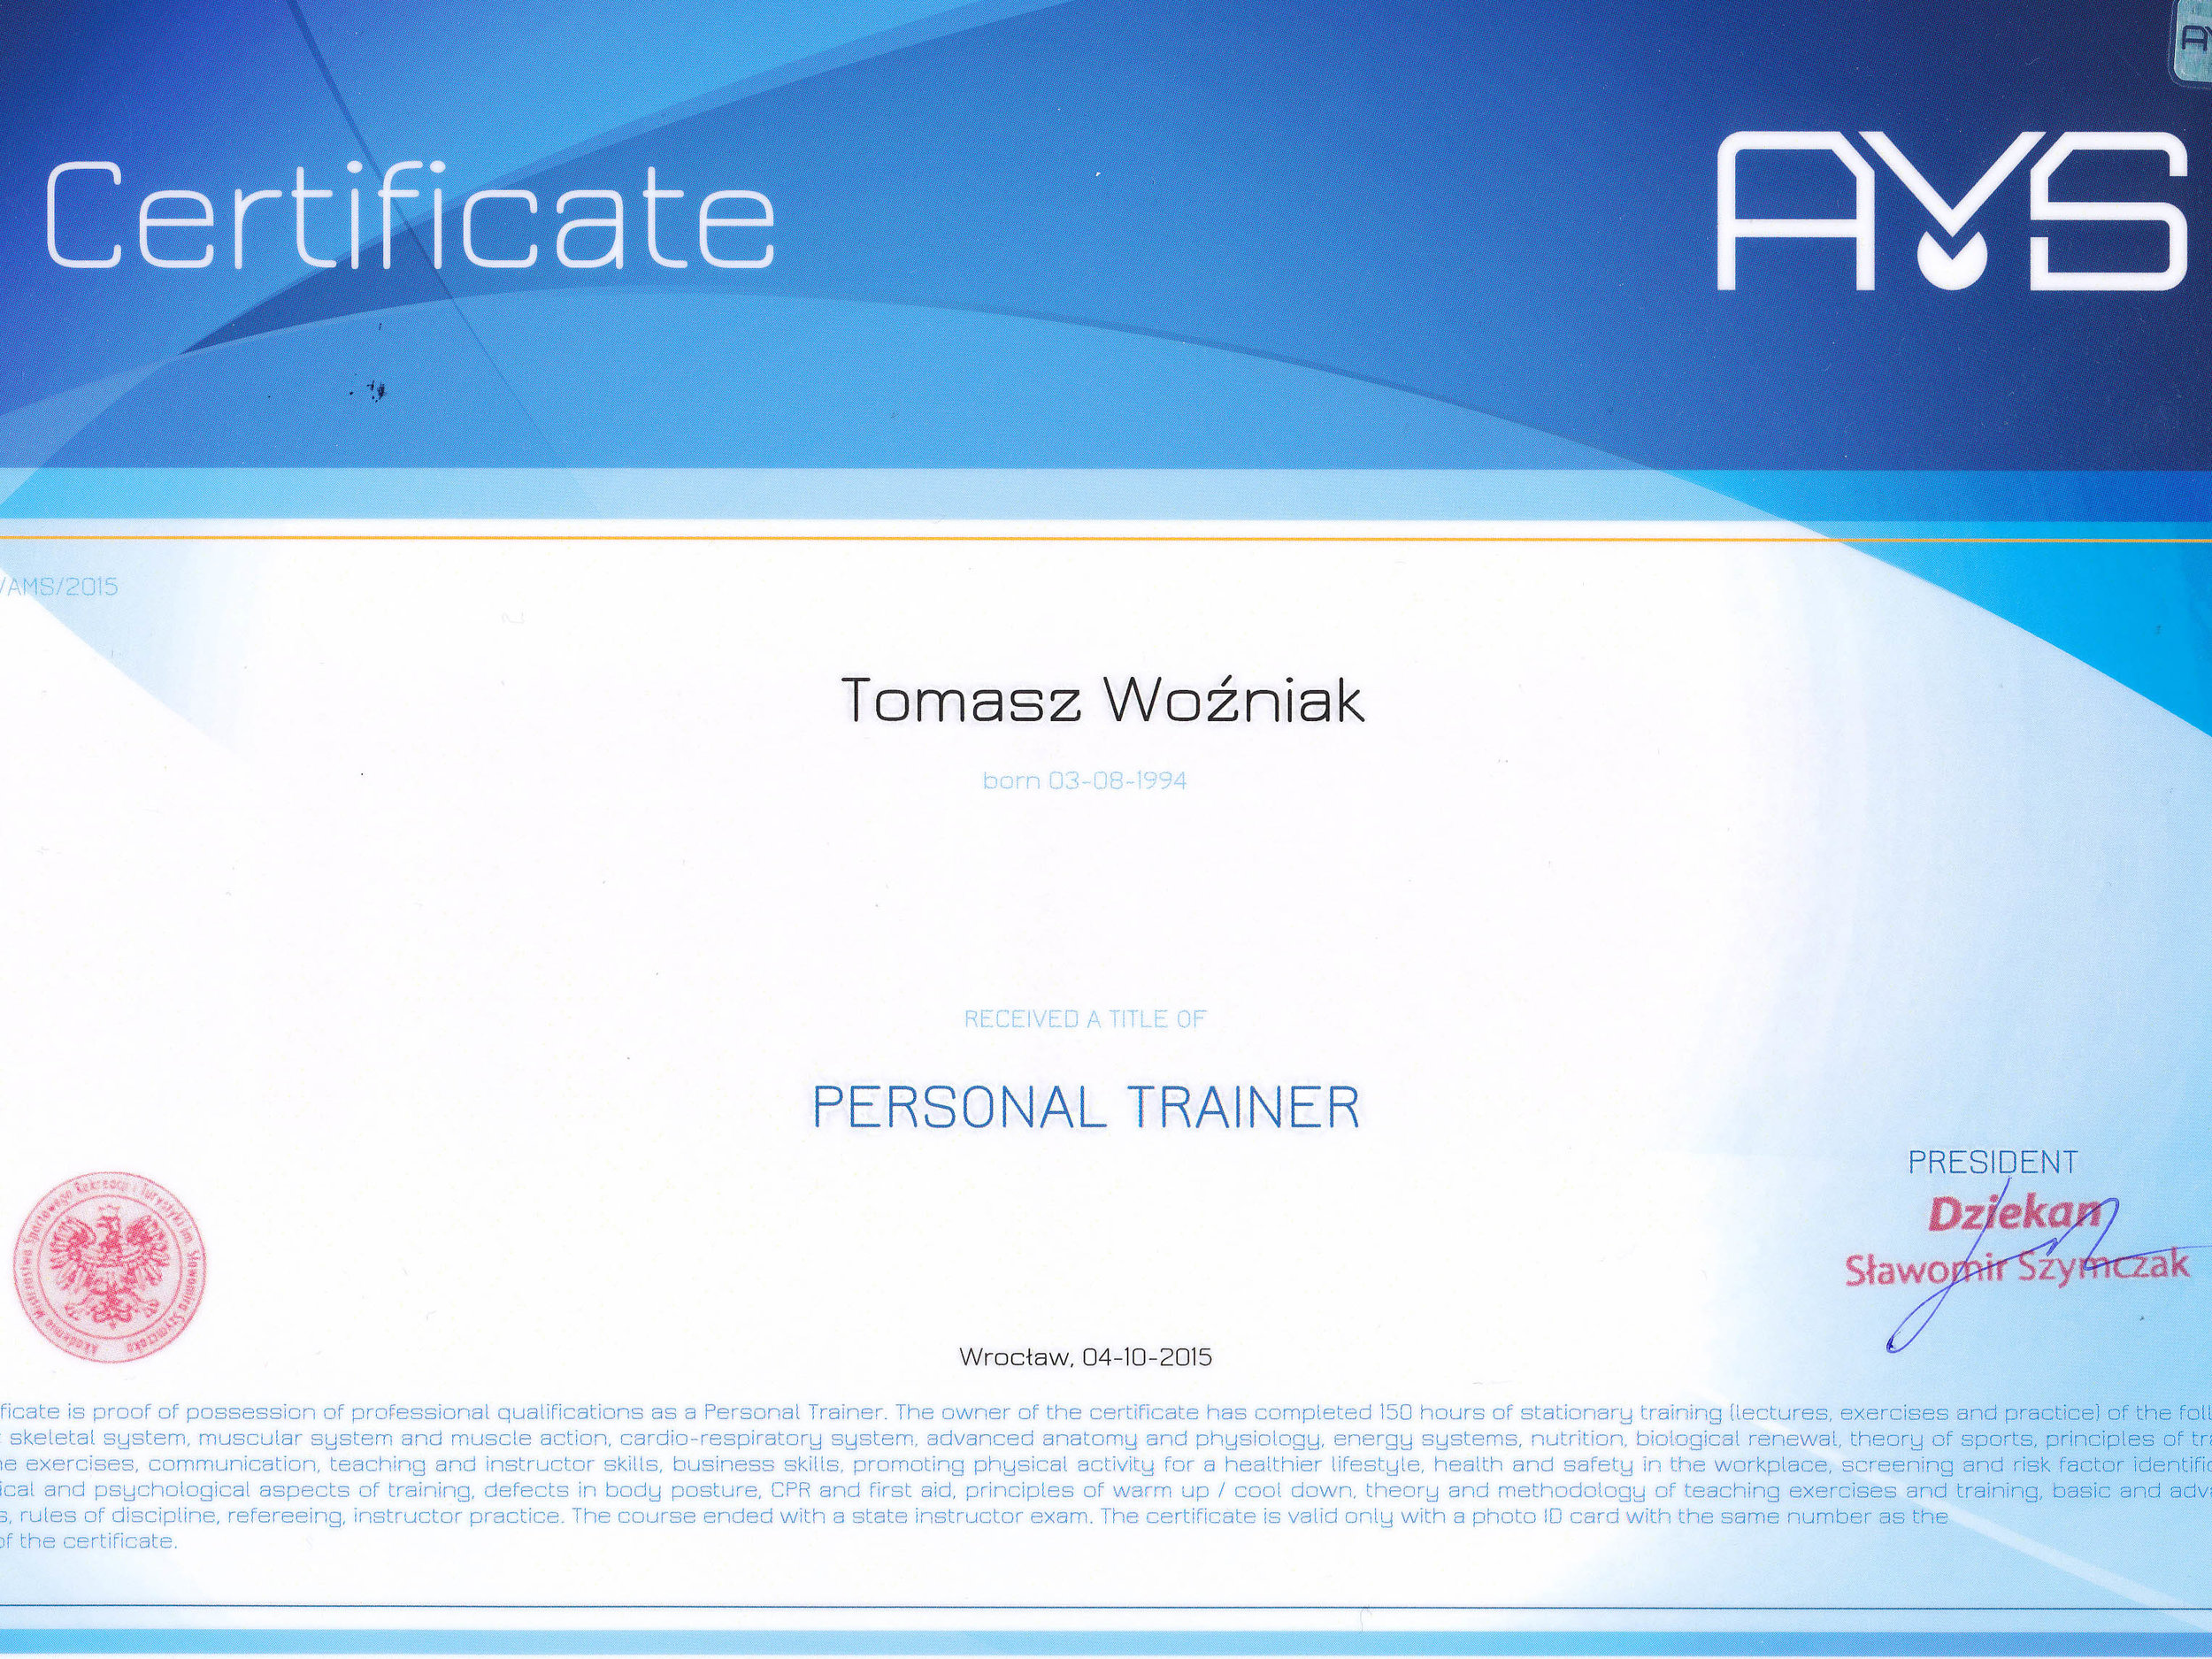 Tomasz Woźniak certyfikat 4.jpg